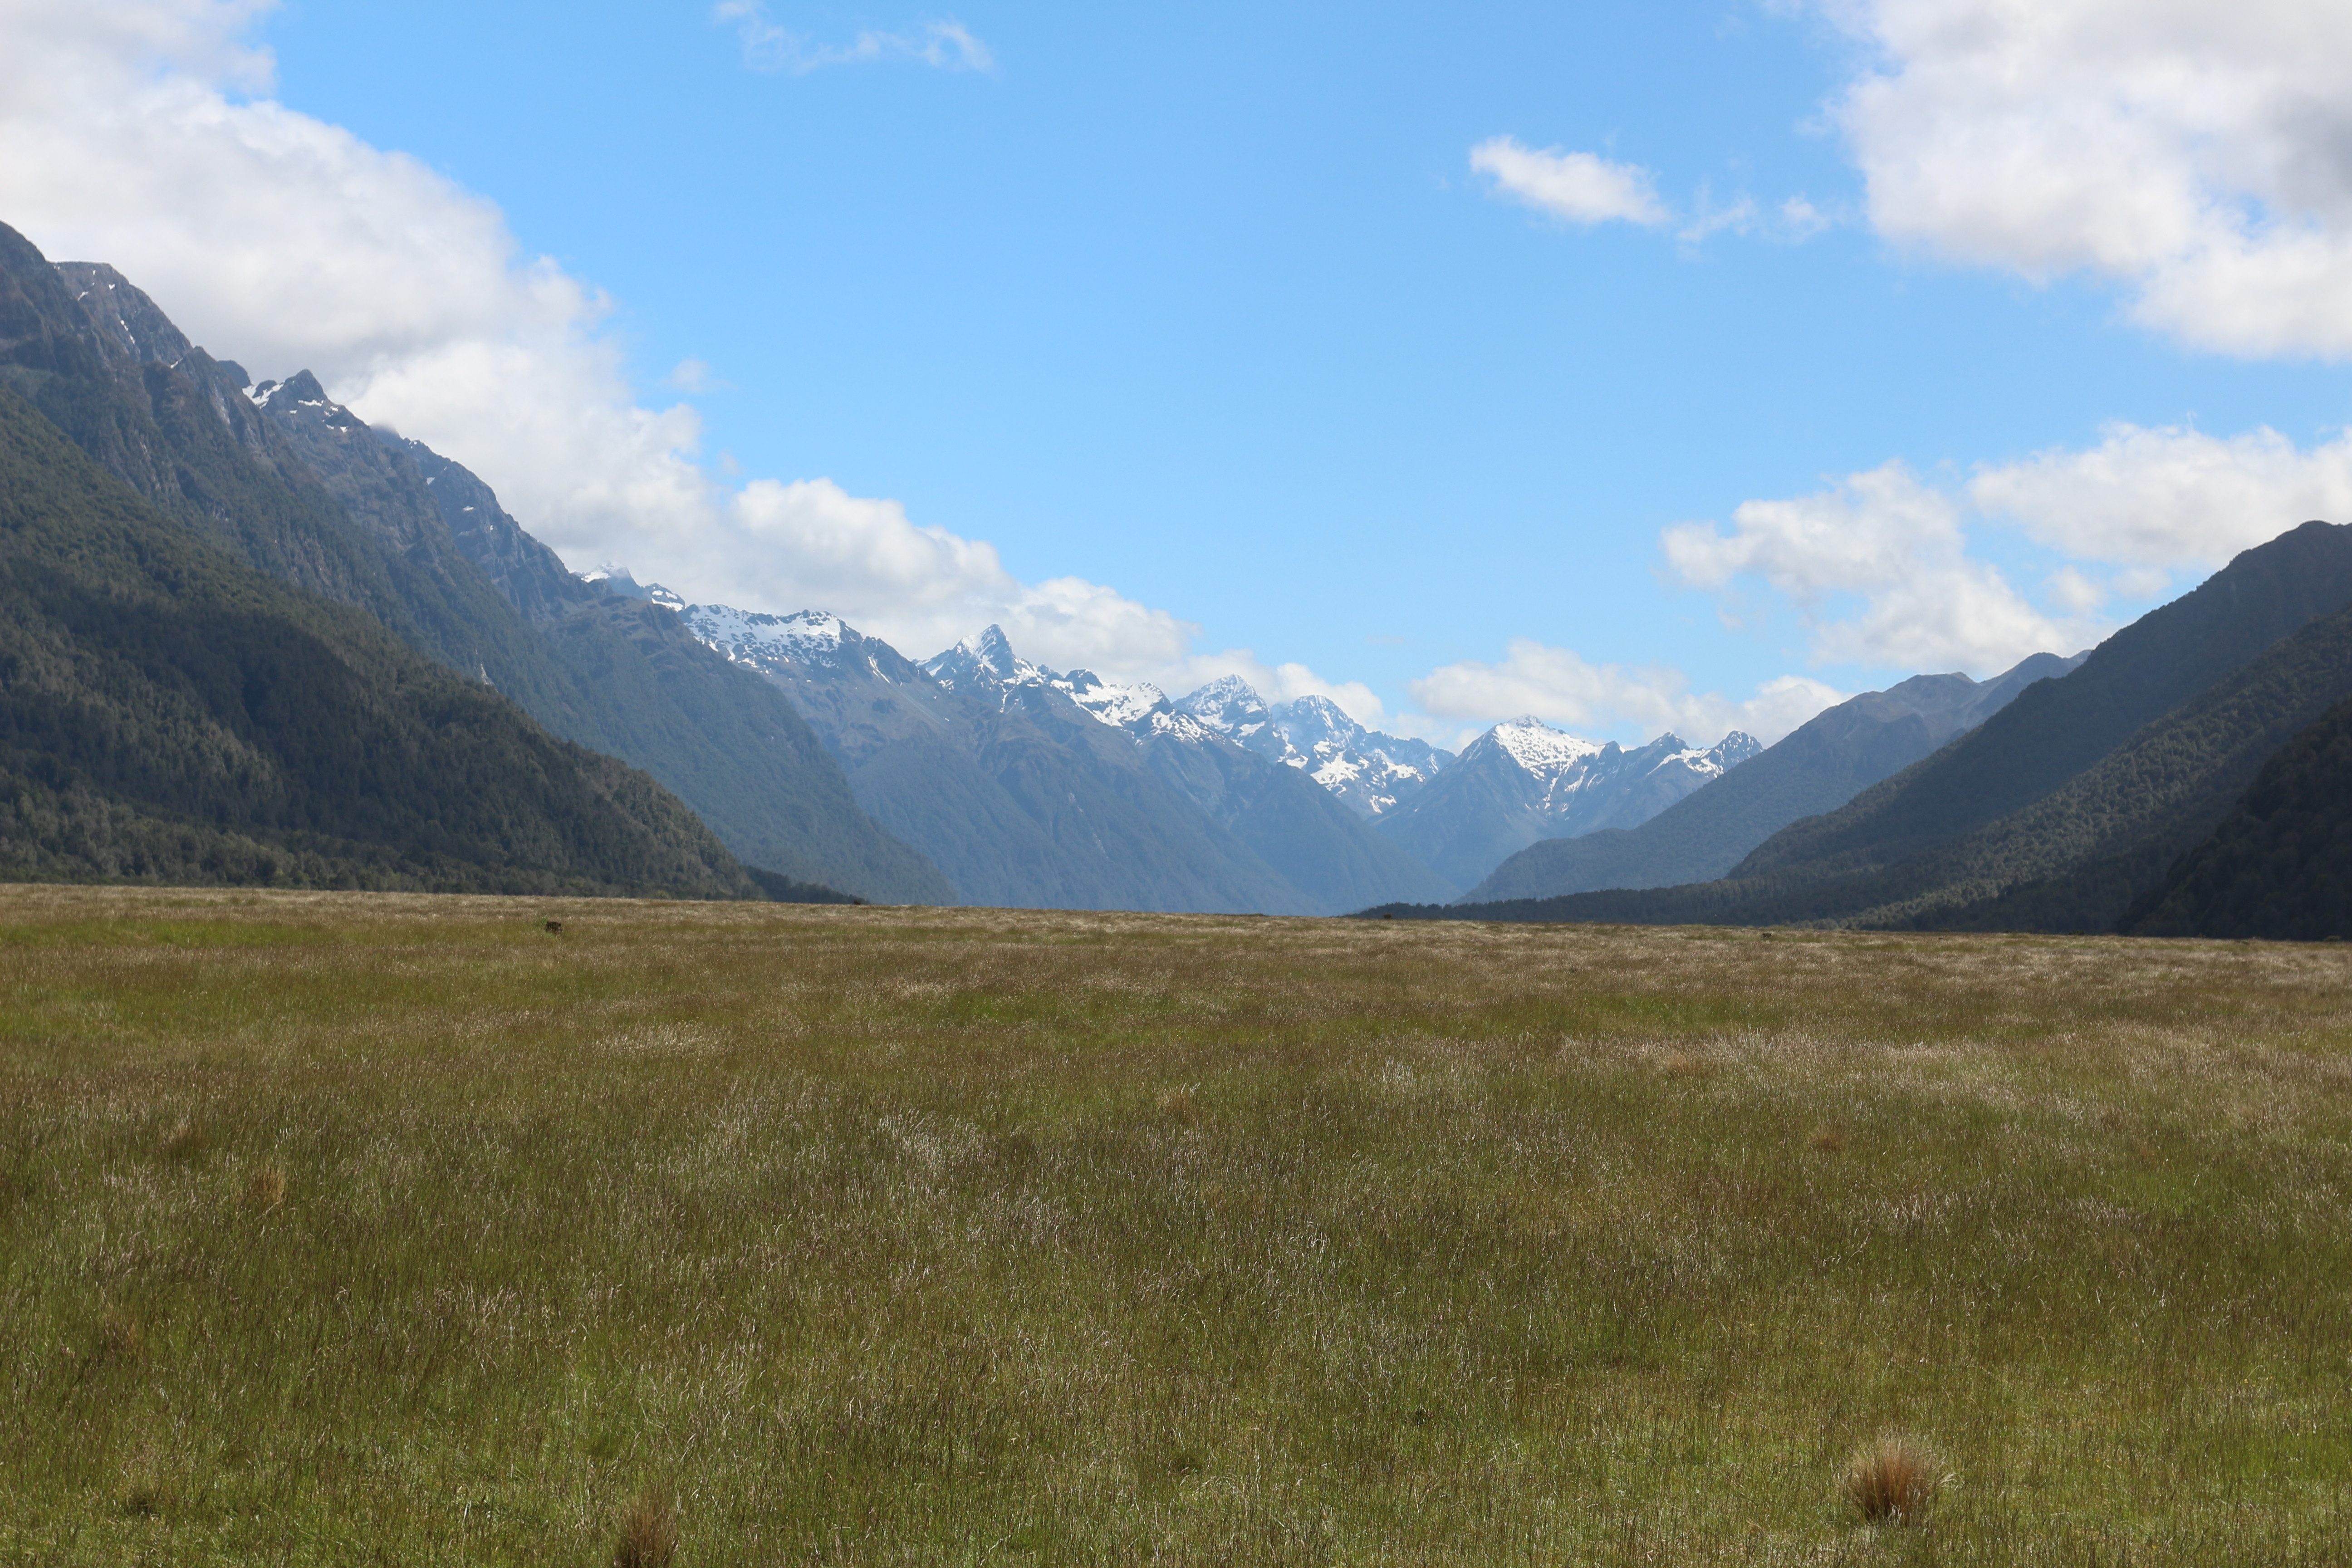 General 5184x3456 New Zealand Fiordland National Park landscape nature mountains